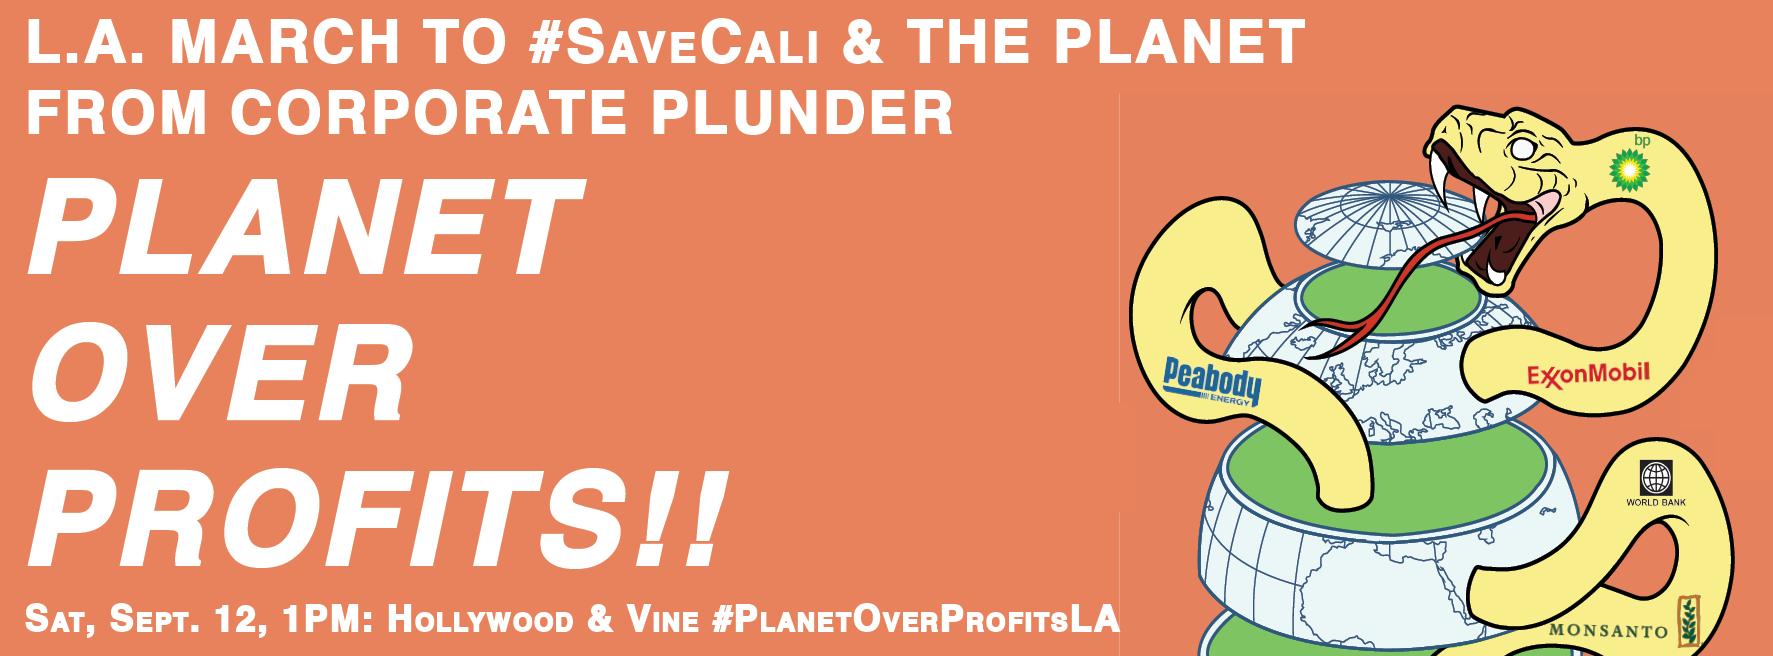 planetoverprofits.png